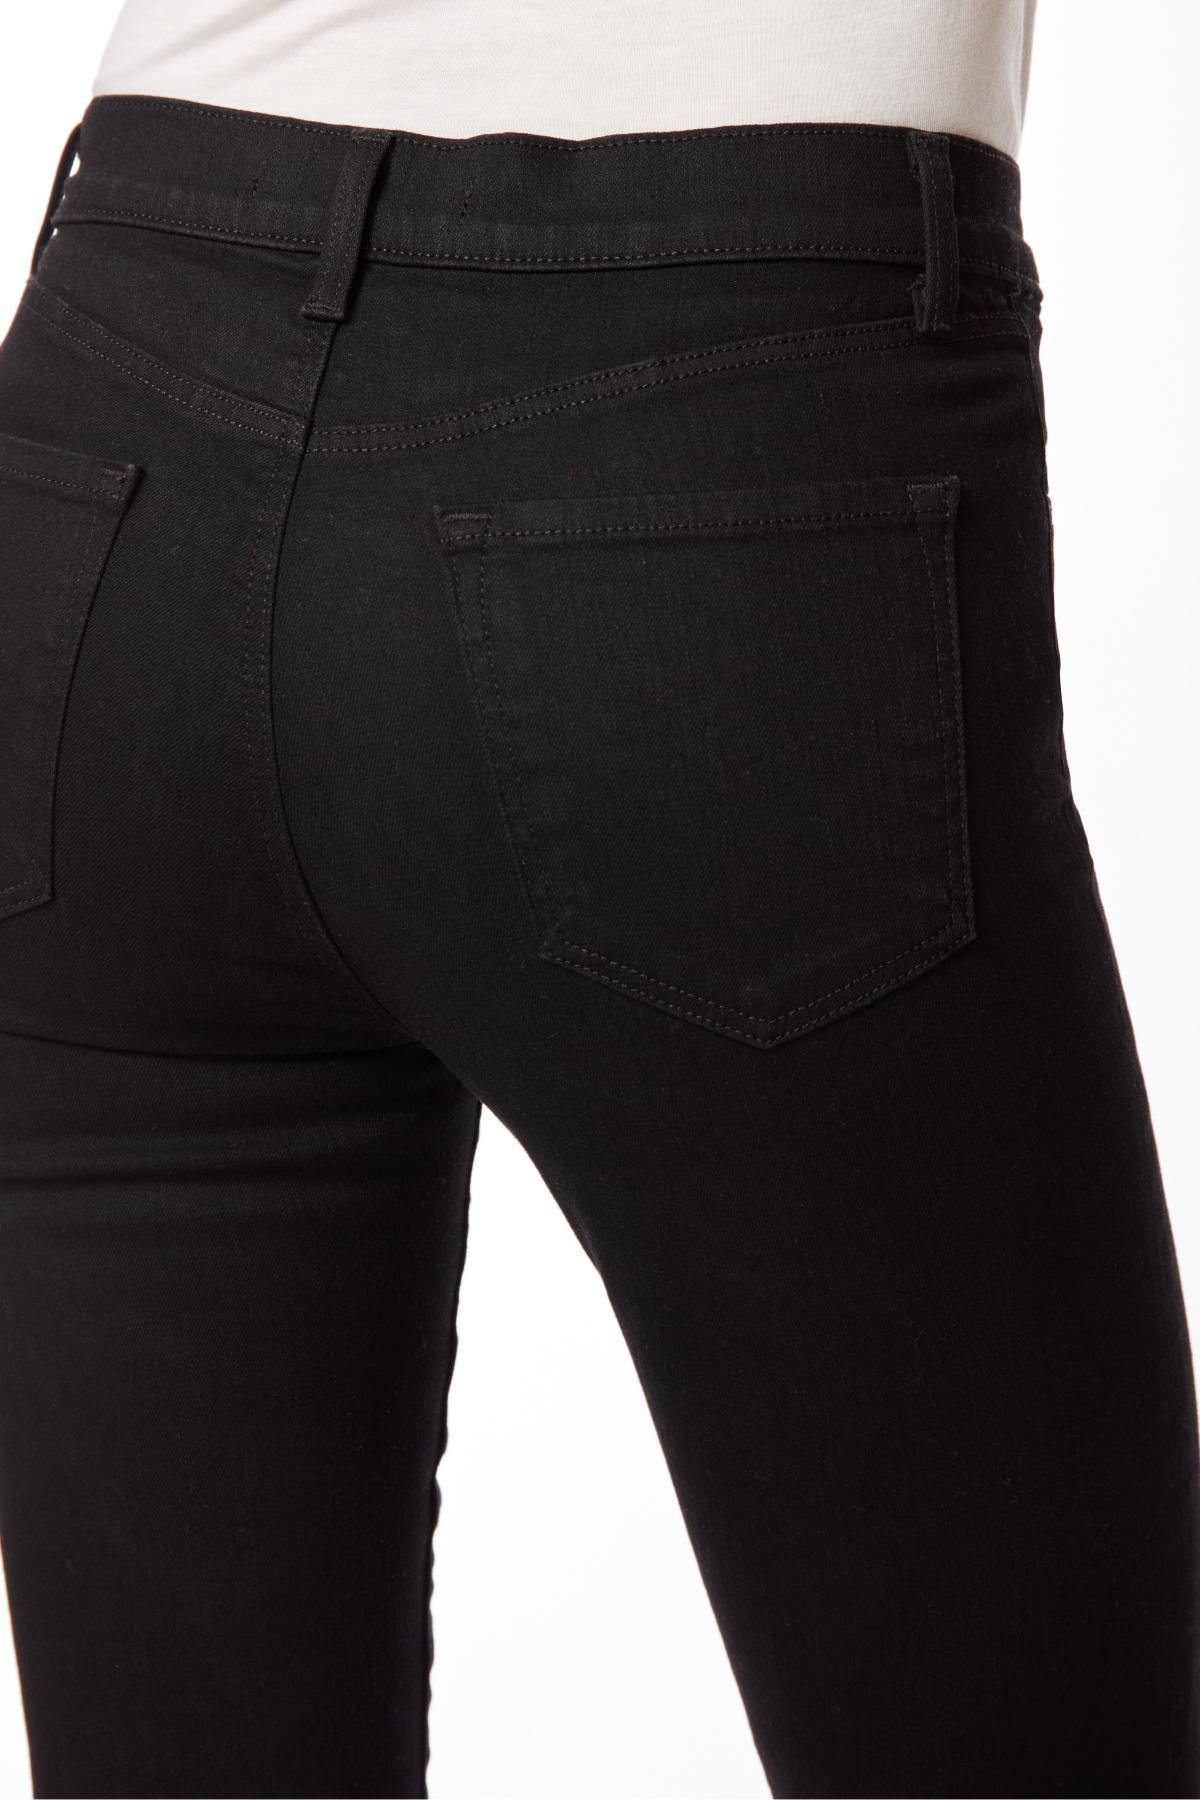 831d02e2b468 J Brand - Black 23127 Photo Ready Alana High-rise Super Skinny Crop In  Vanity. View fullscreen